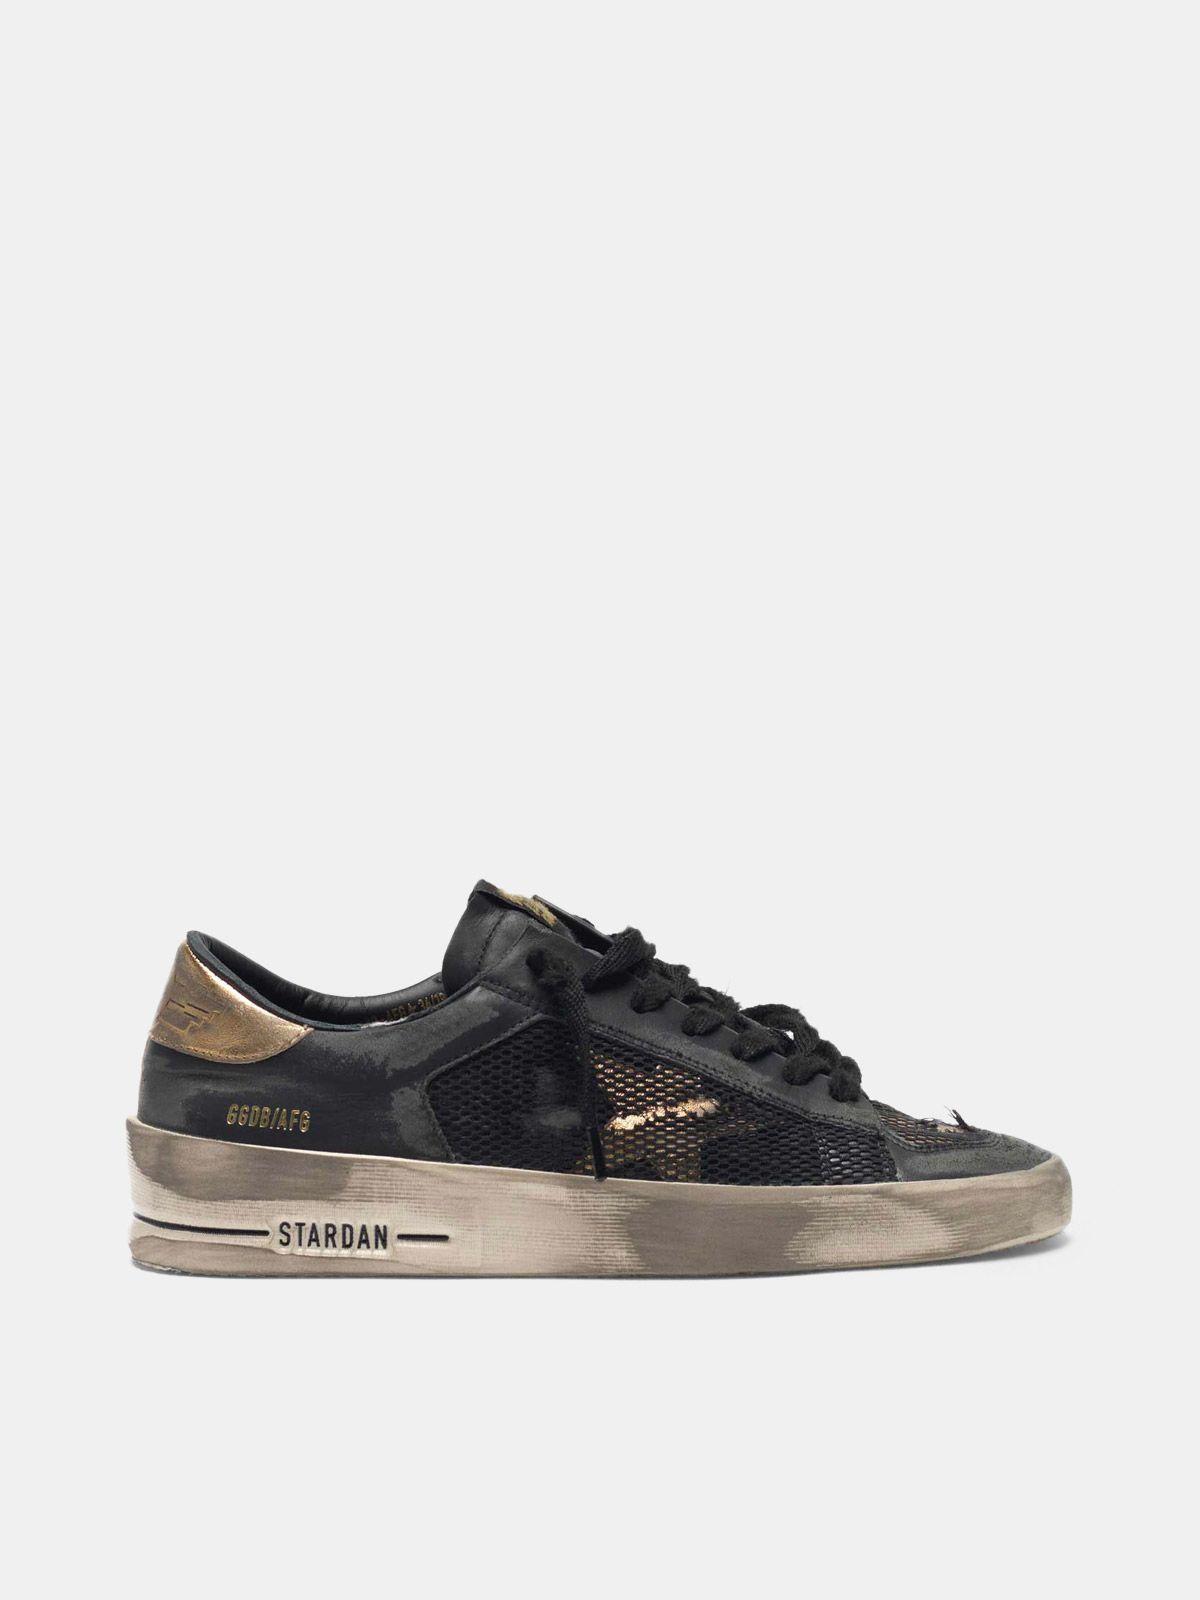 Golden Goose - Distressed black and gold Stardan LTD sneakers  in